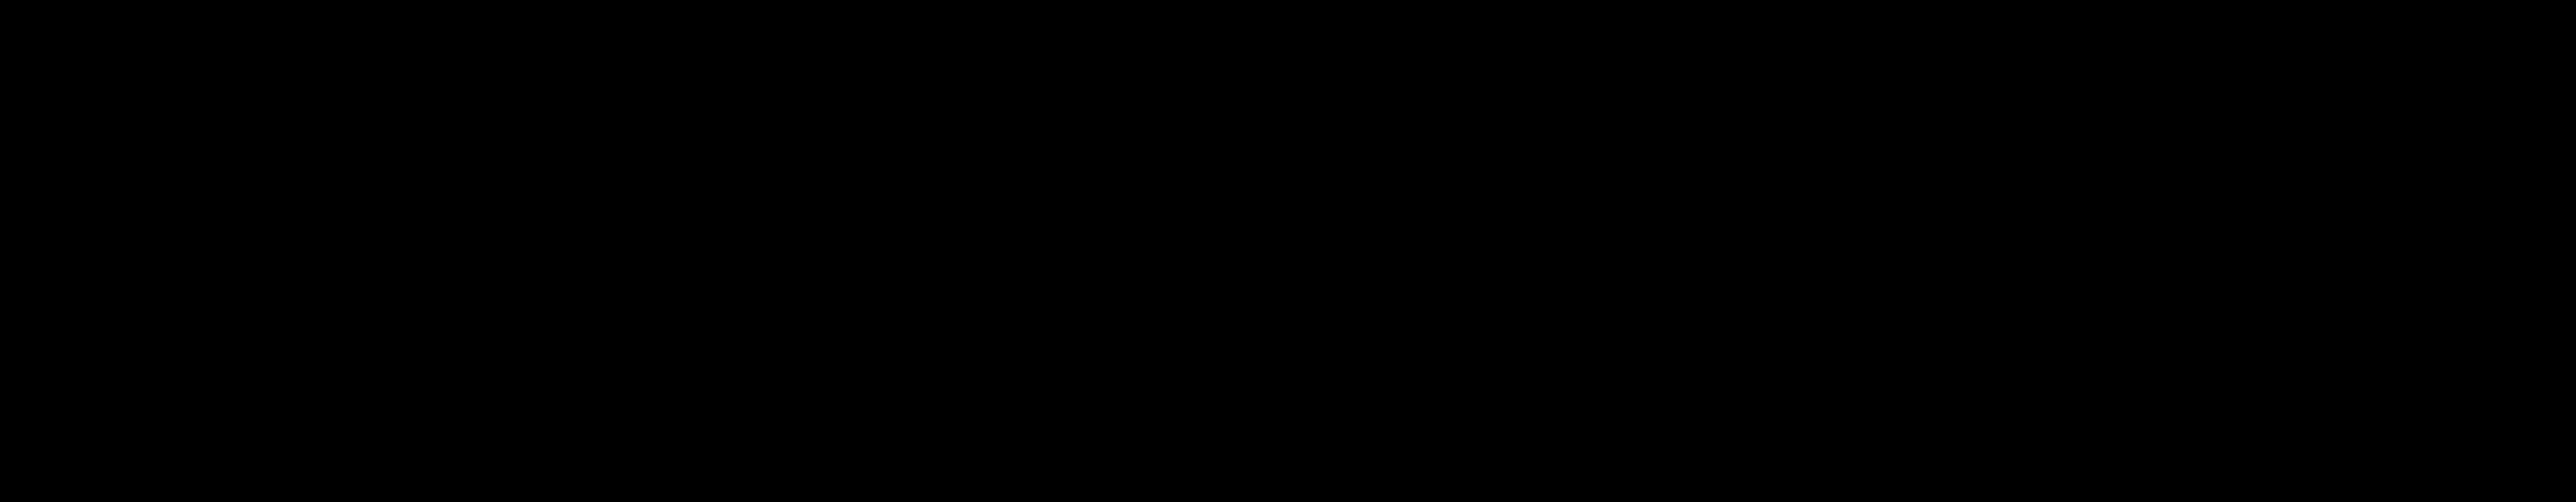 Mac Logo / Cosmetics Logonoidcom.